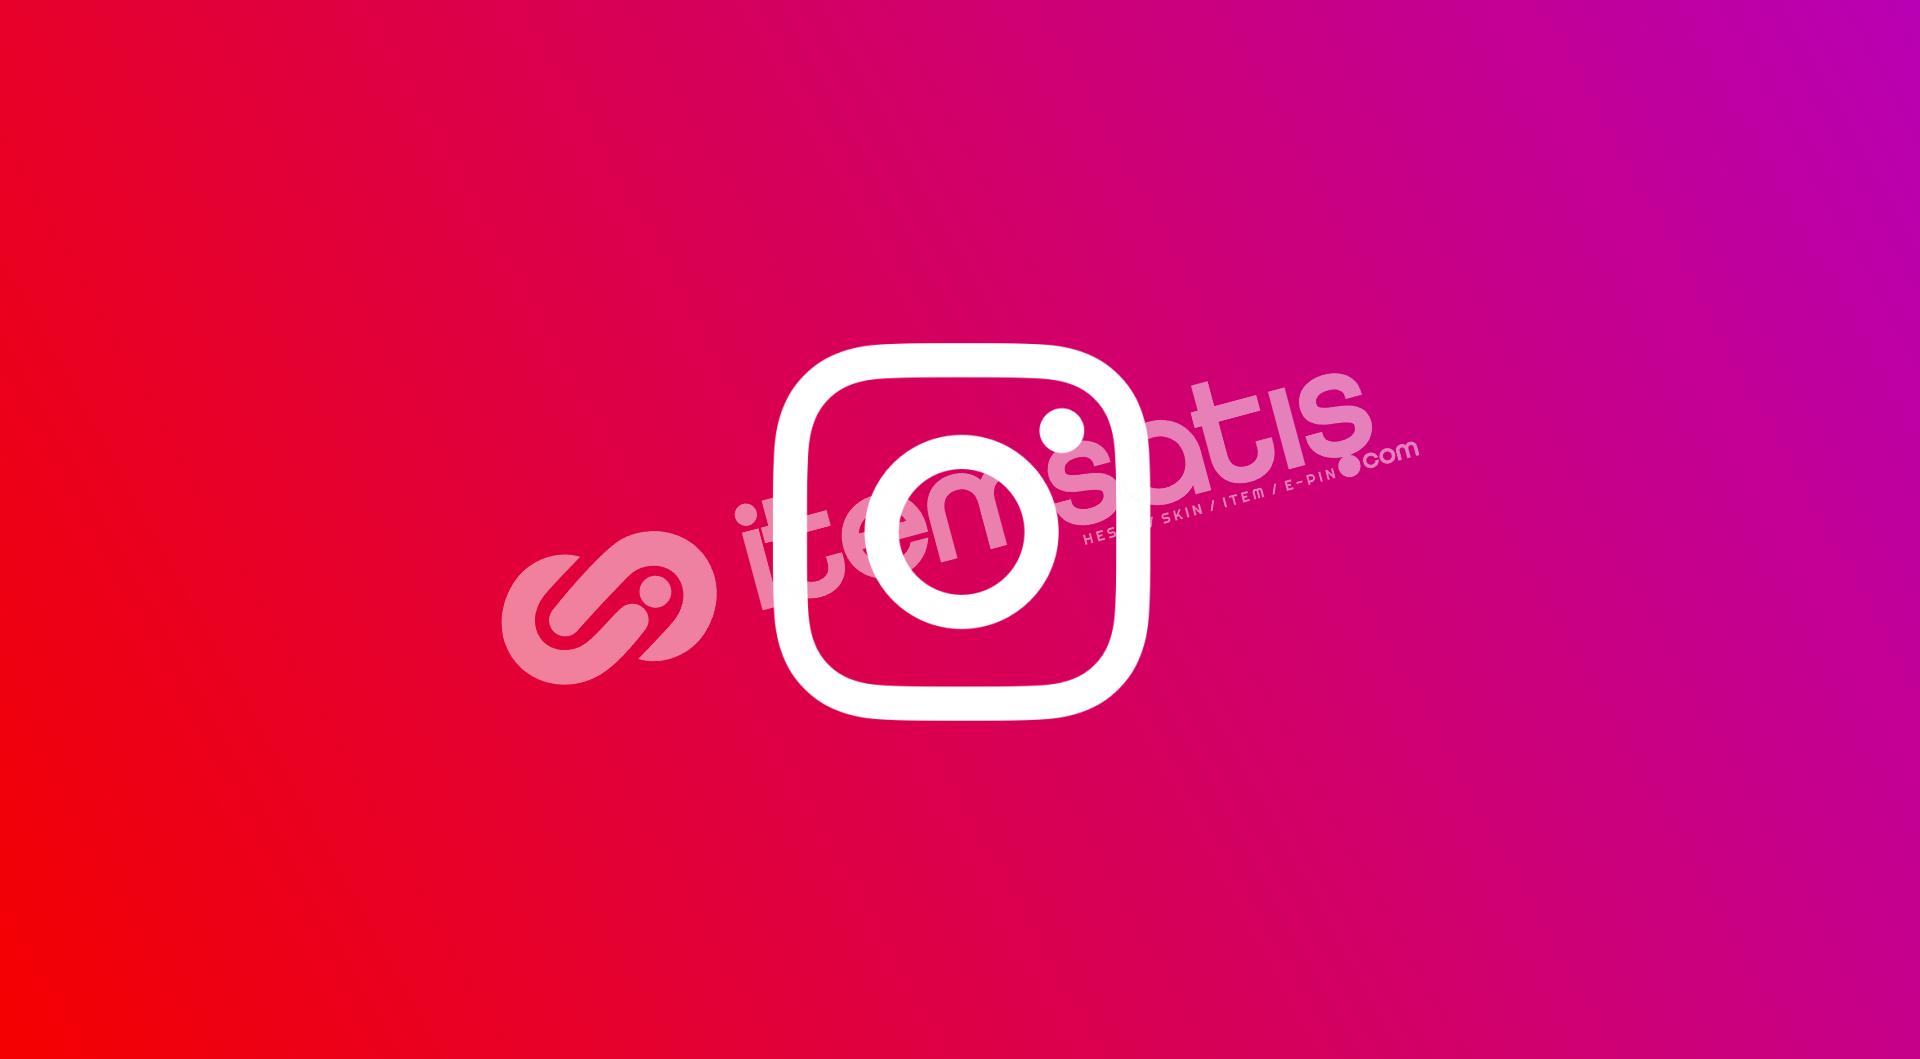 Instagram 2013 tarihli hesap